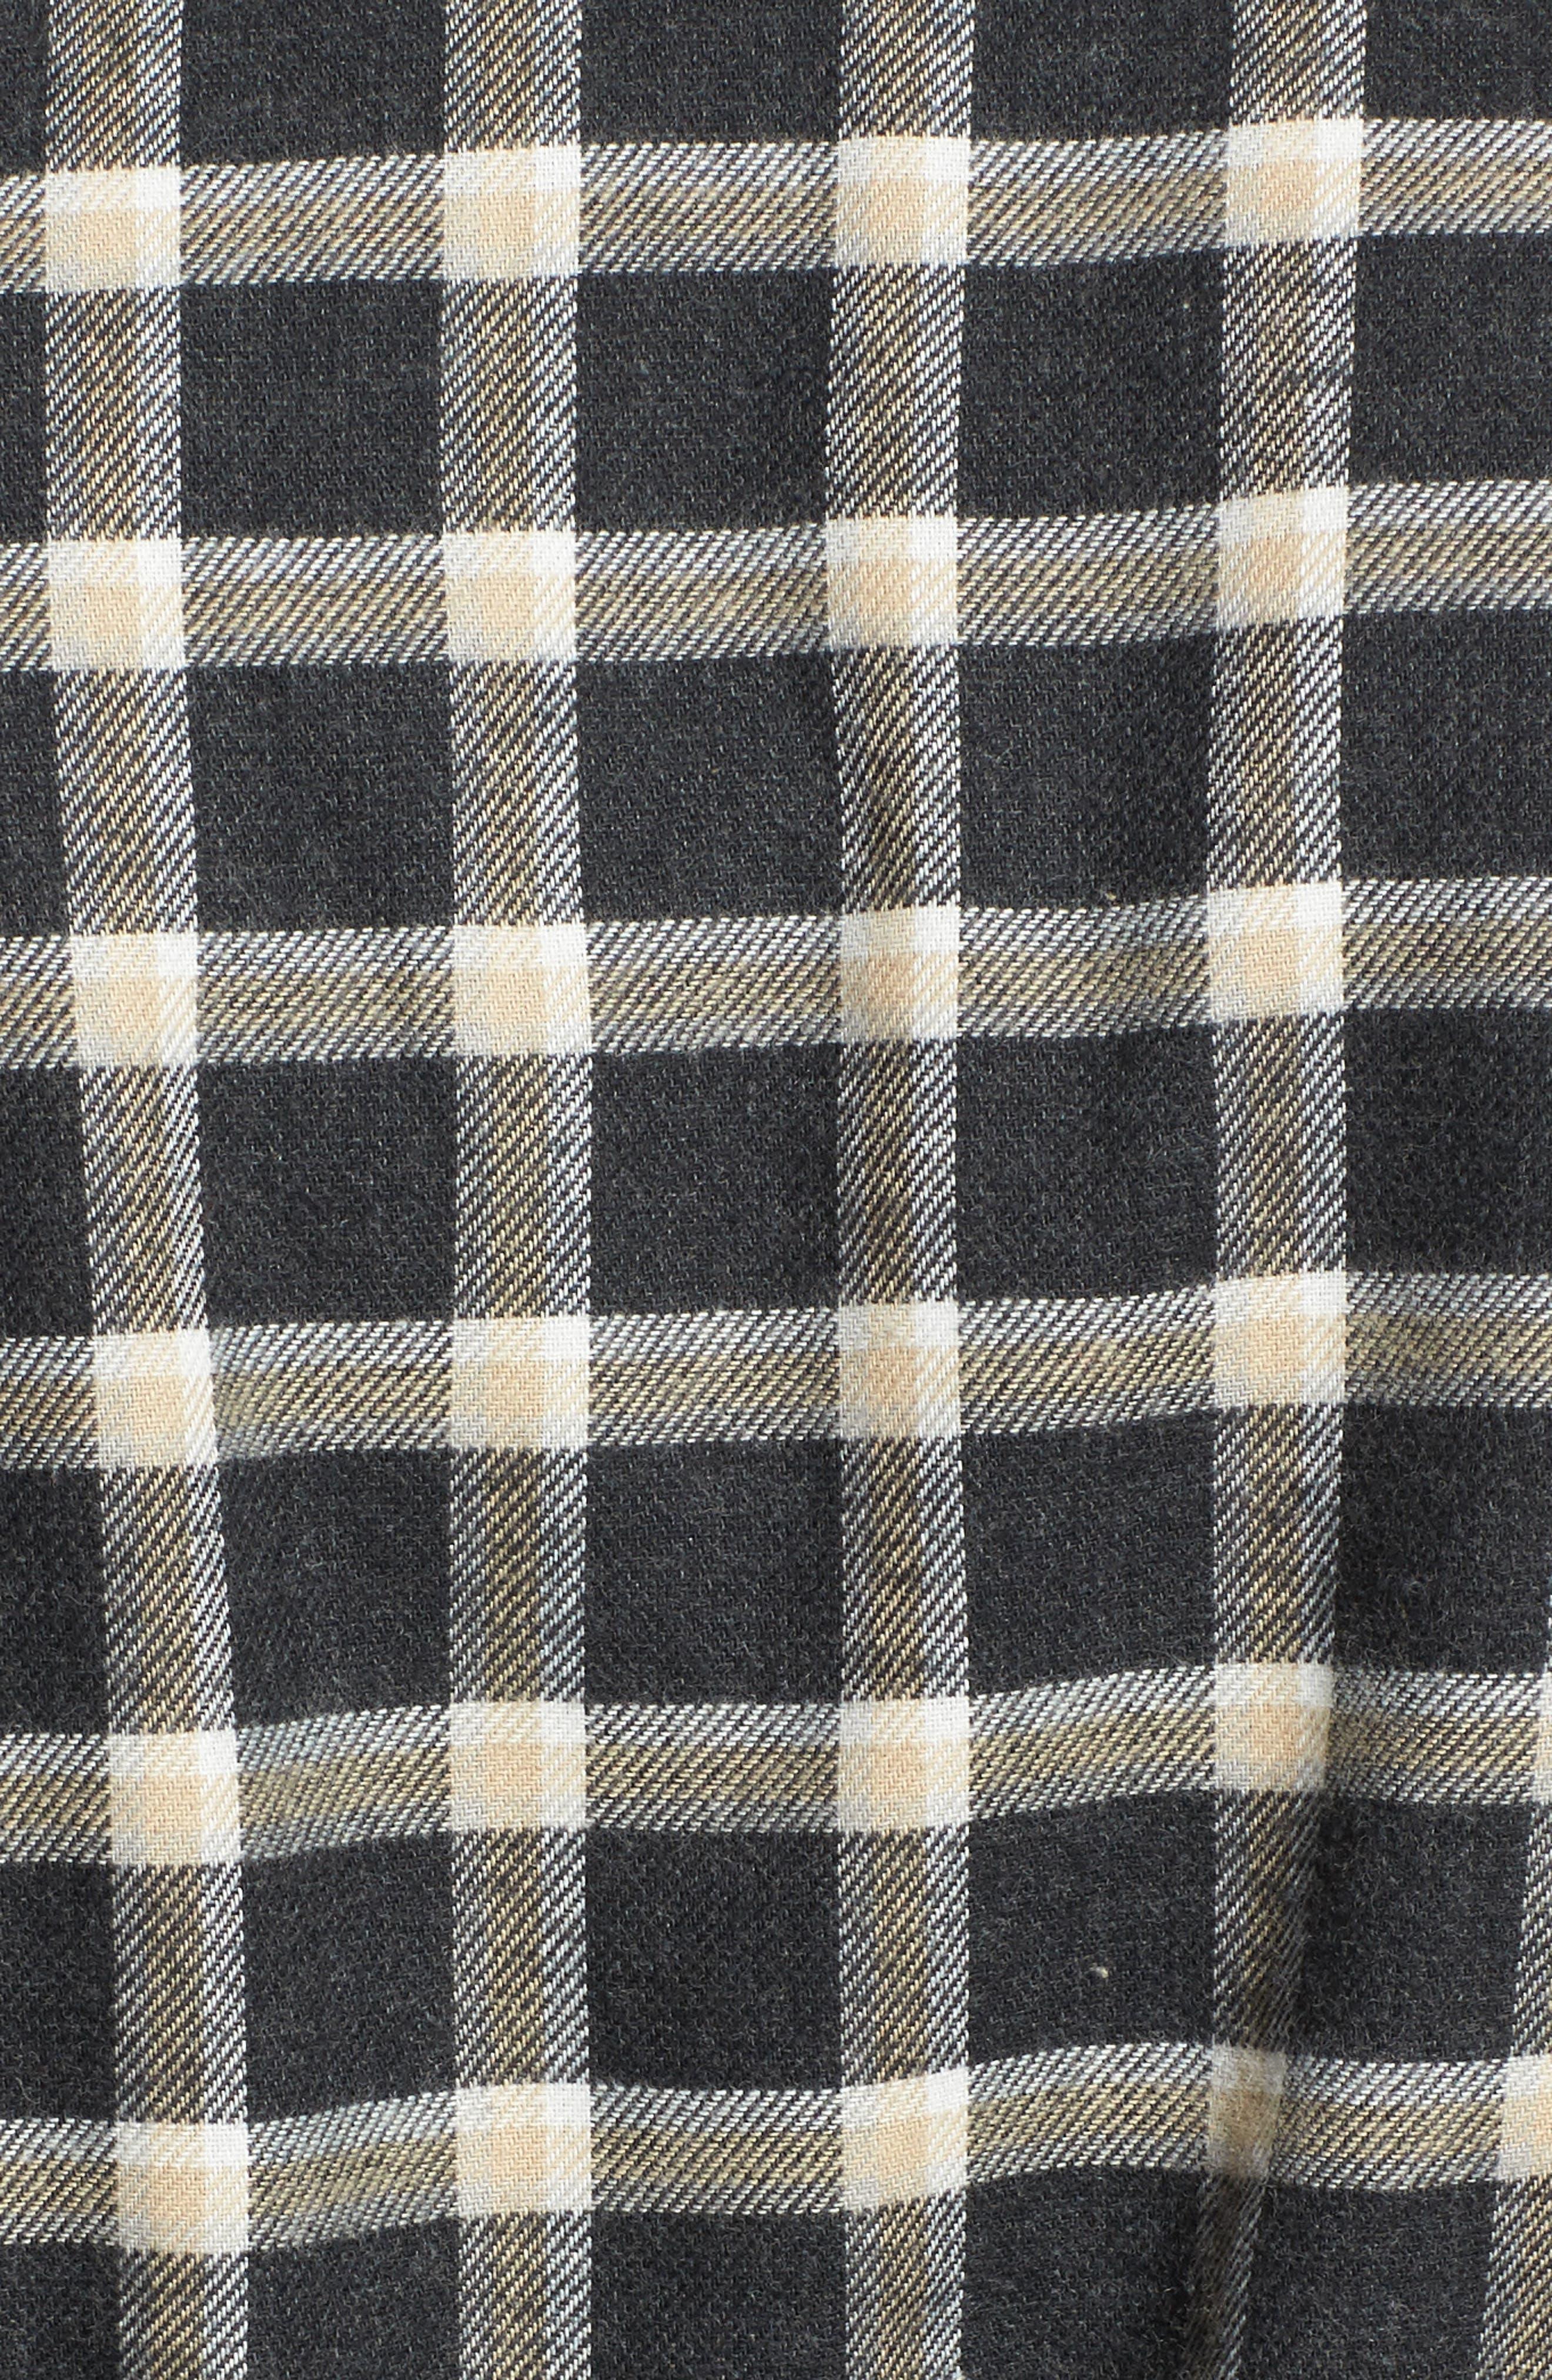 Kalib Plaid Flannel Robe,                             Alternate thumbnail 15, color,